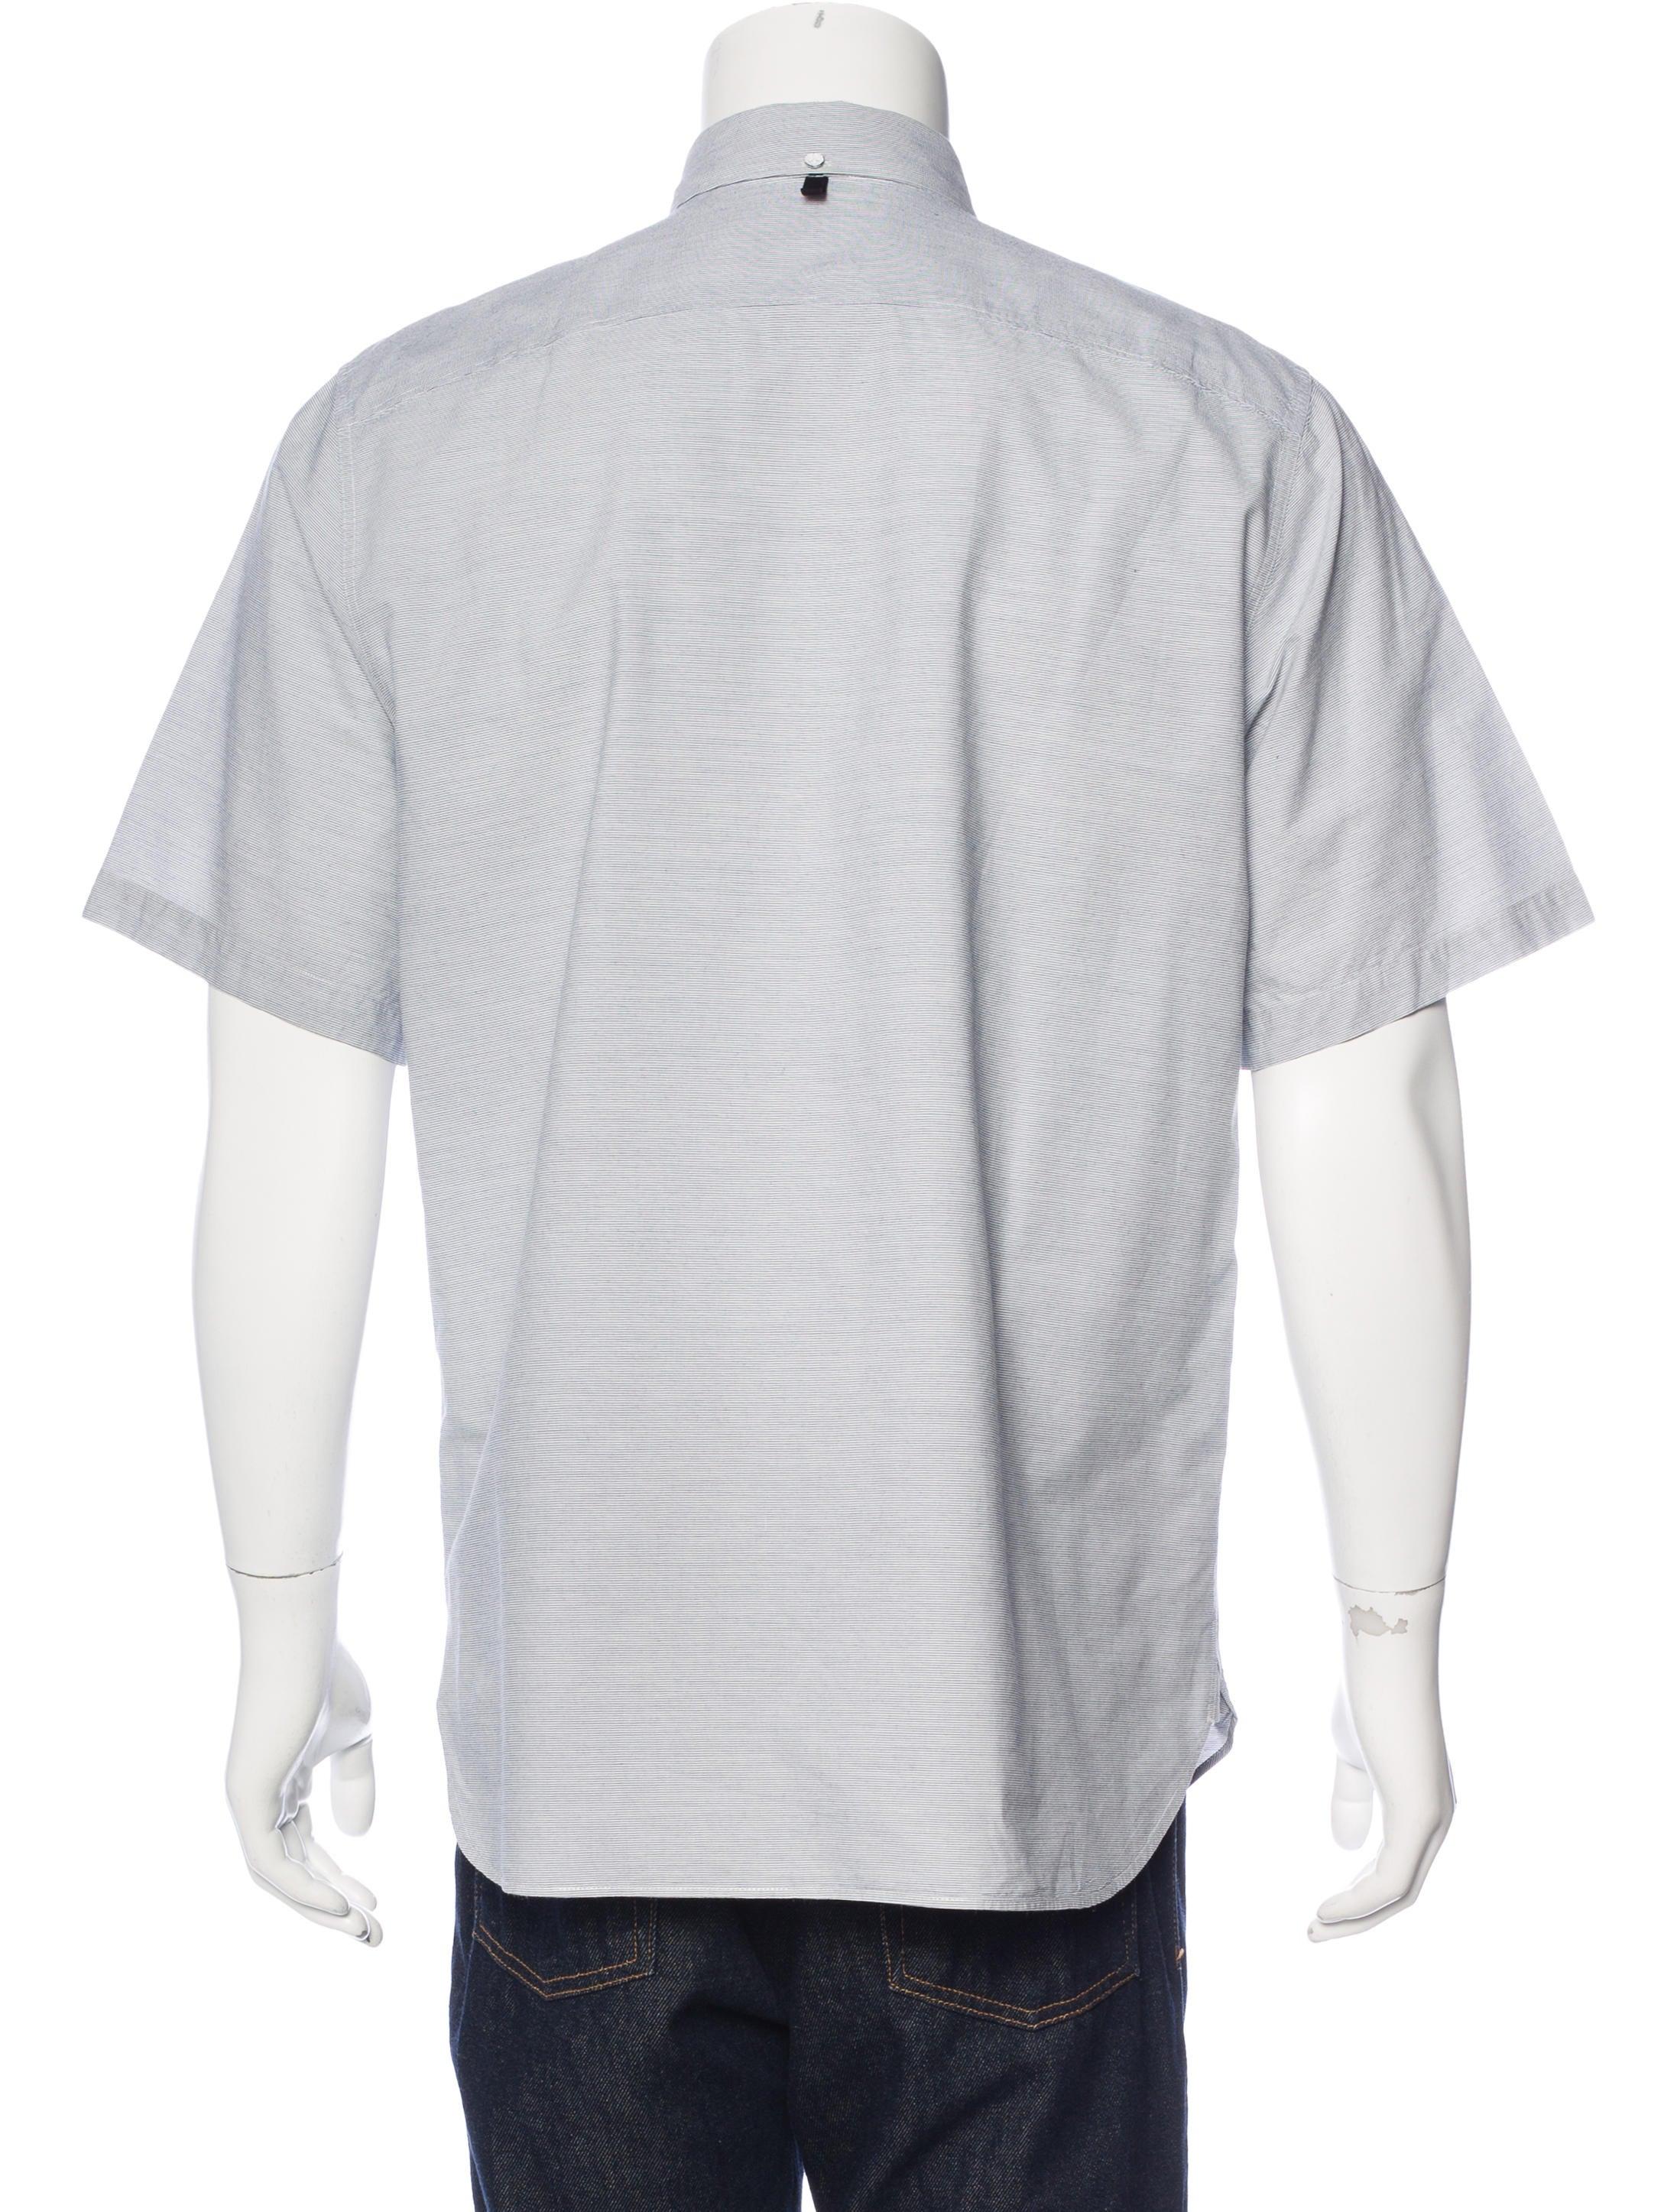 Rag bone striped button down shirt clothing for Rag and bone mens shirts sale